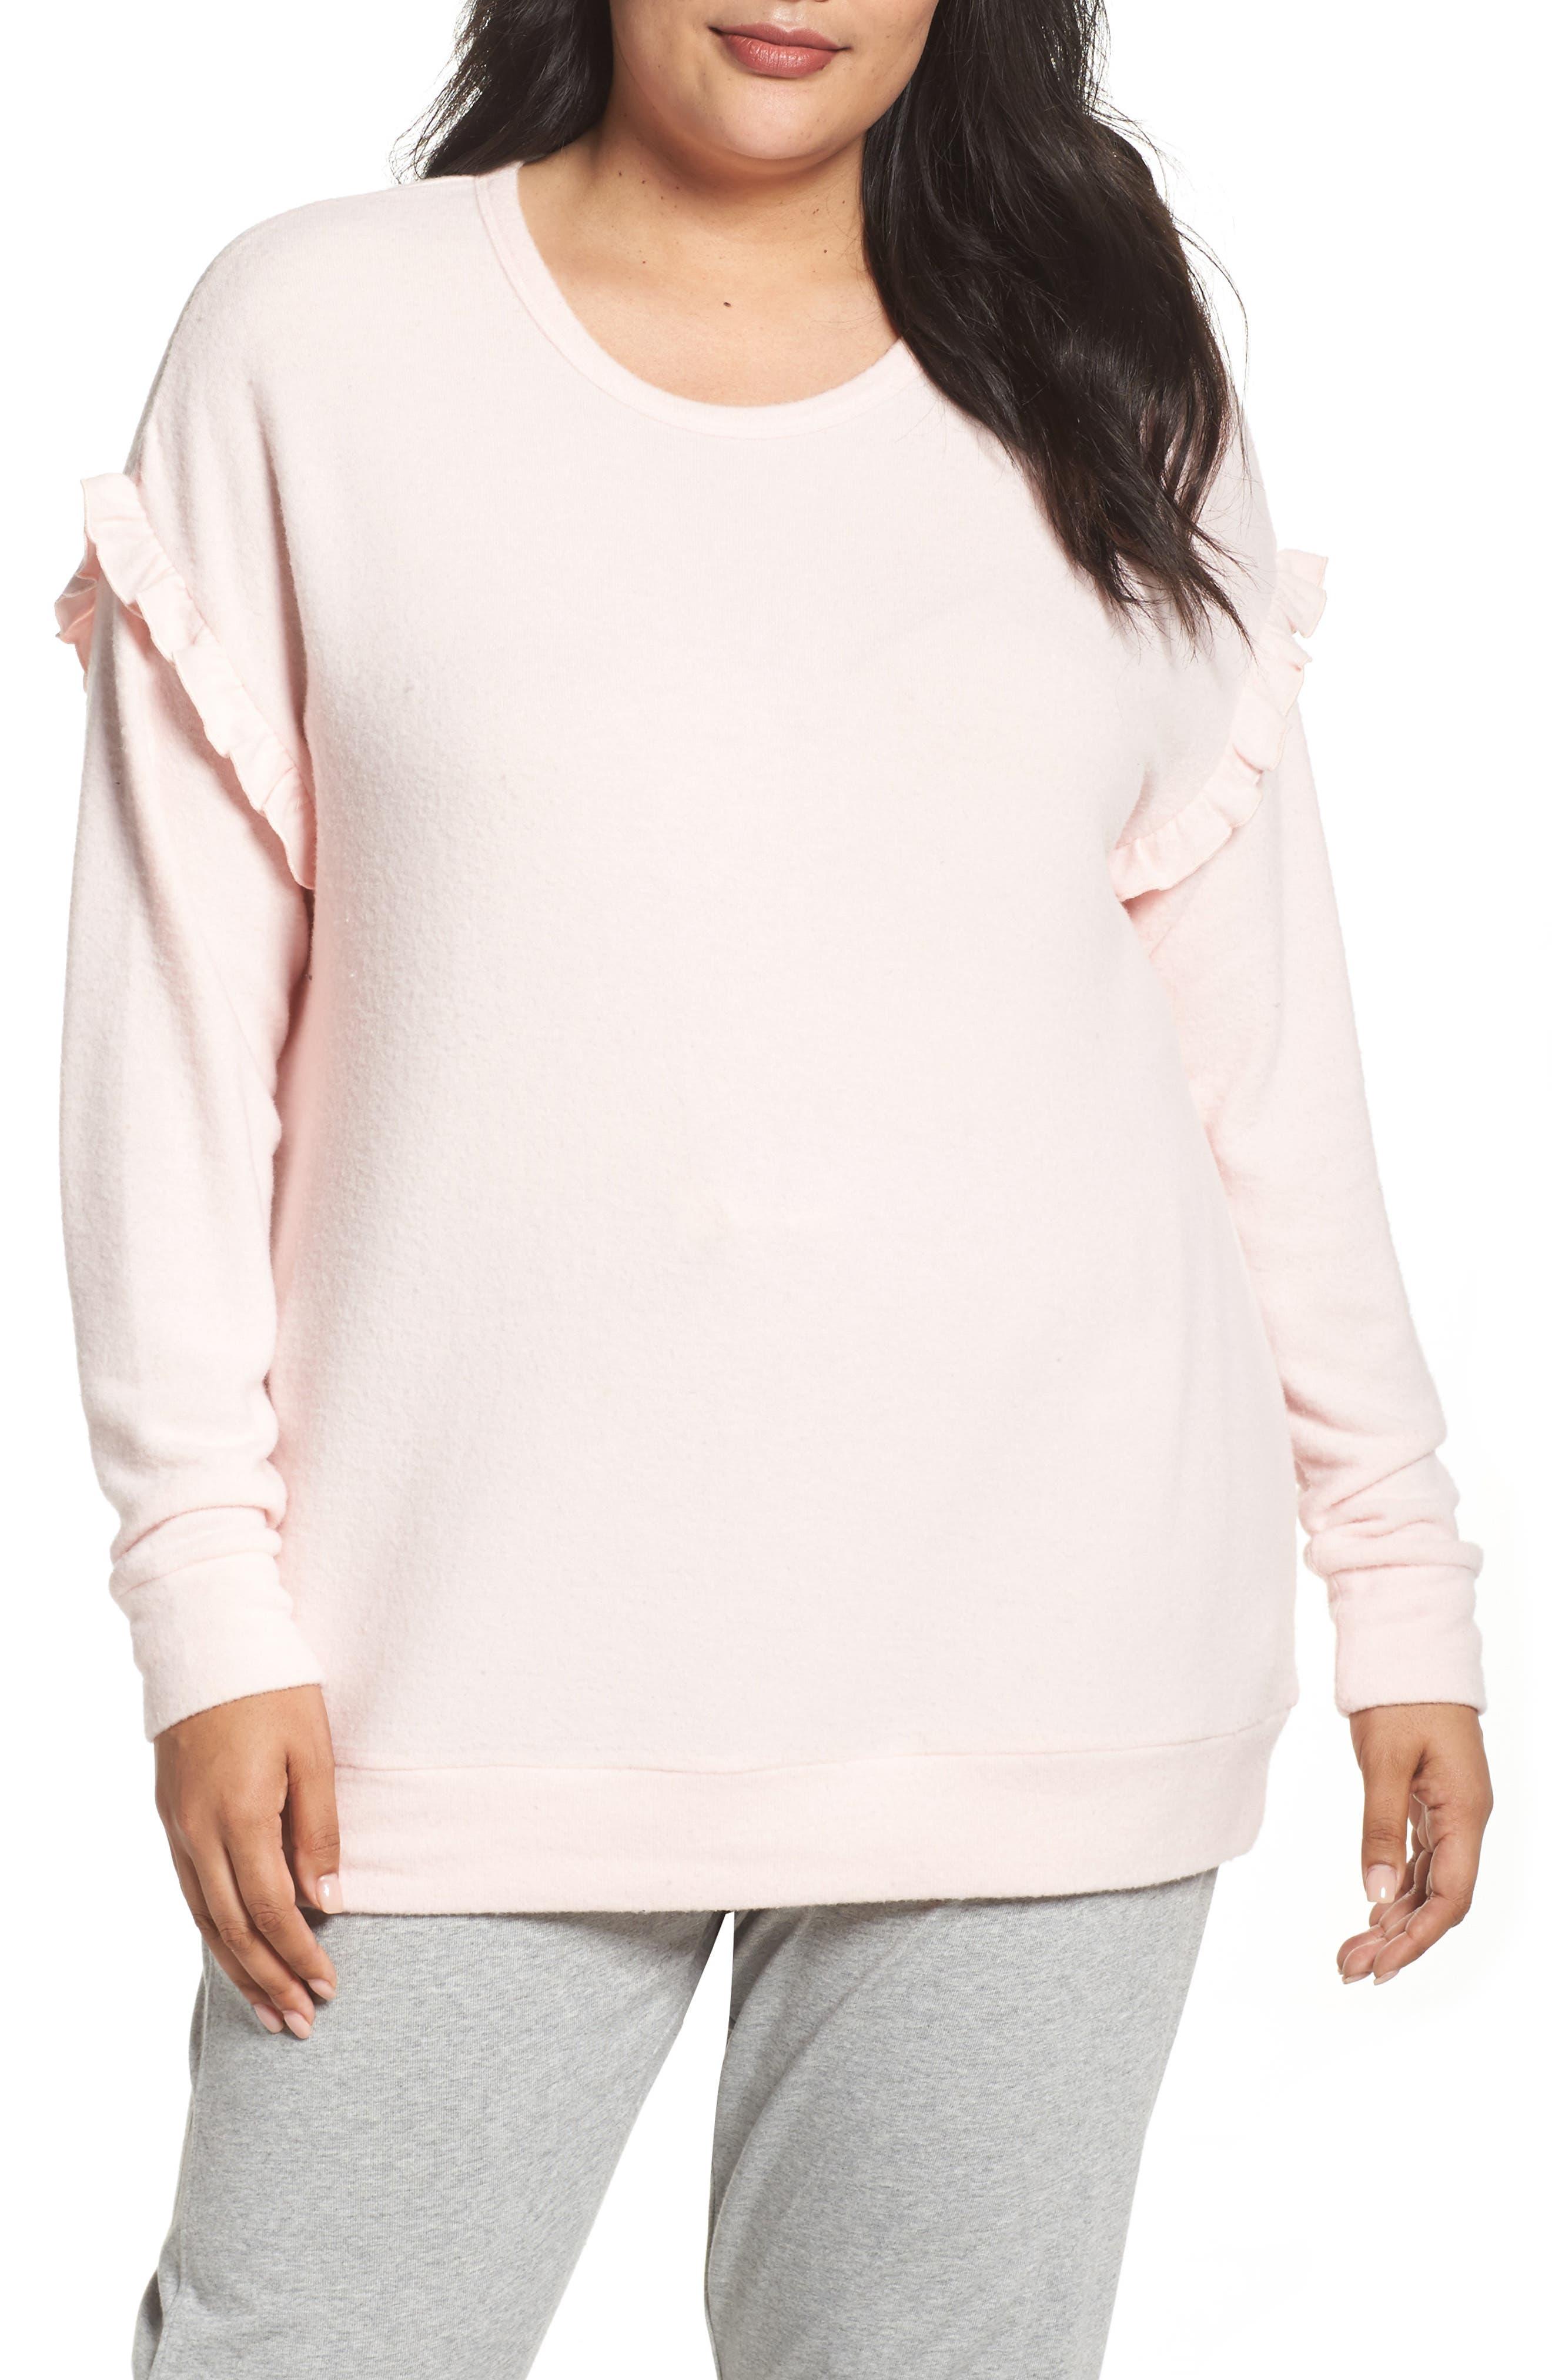 Main Image - PJ Salvage Ruffled Peachy Jersey Crewneck Top (Plus Size)